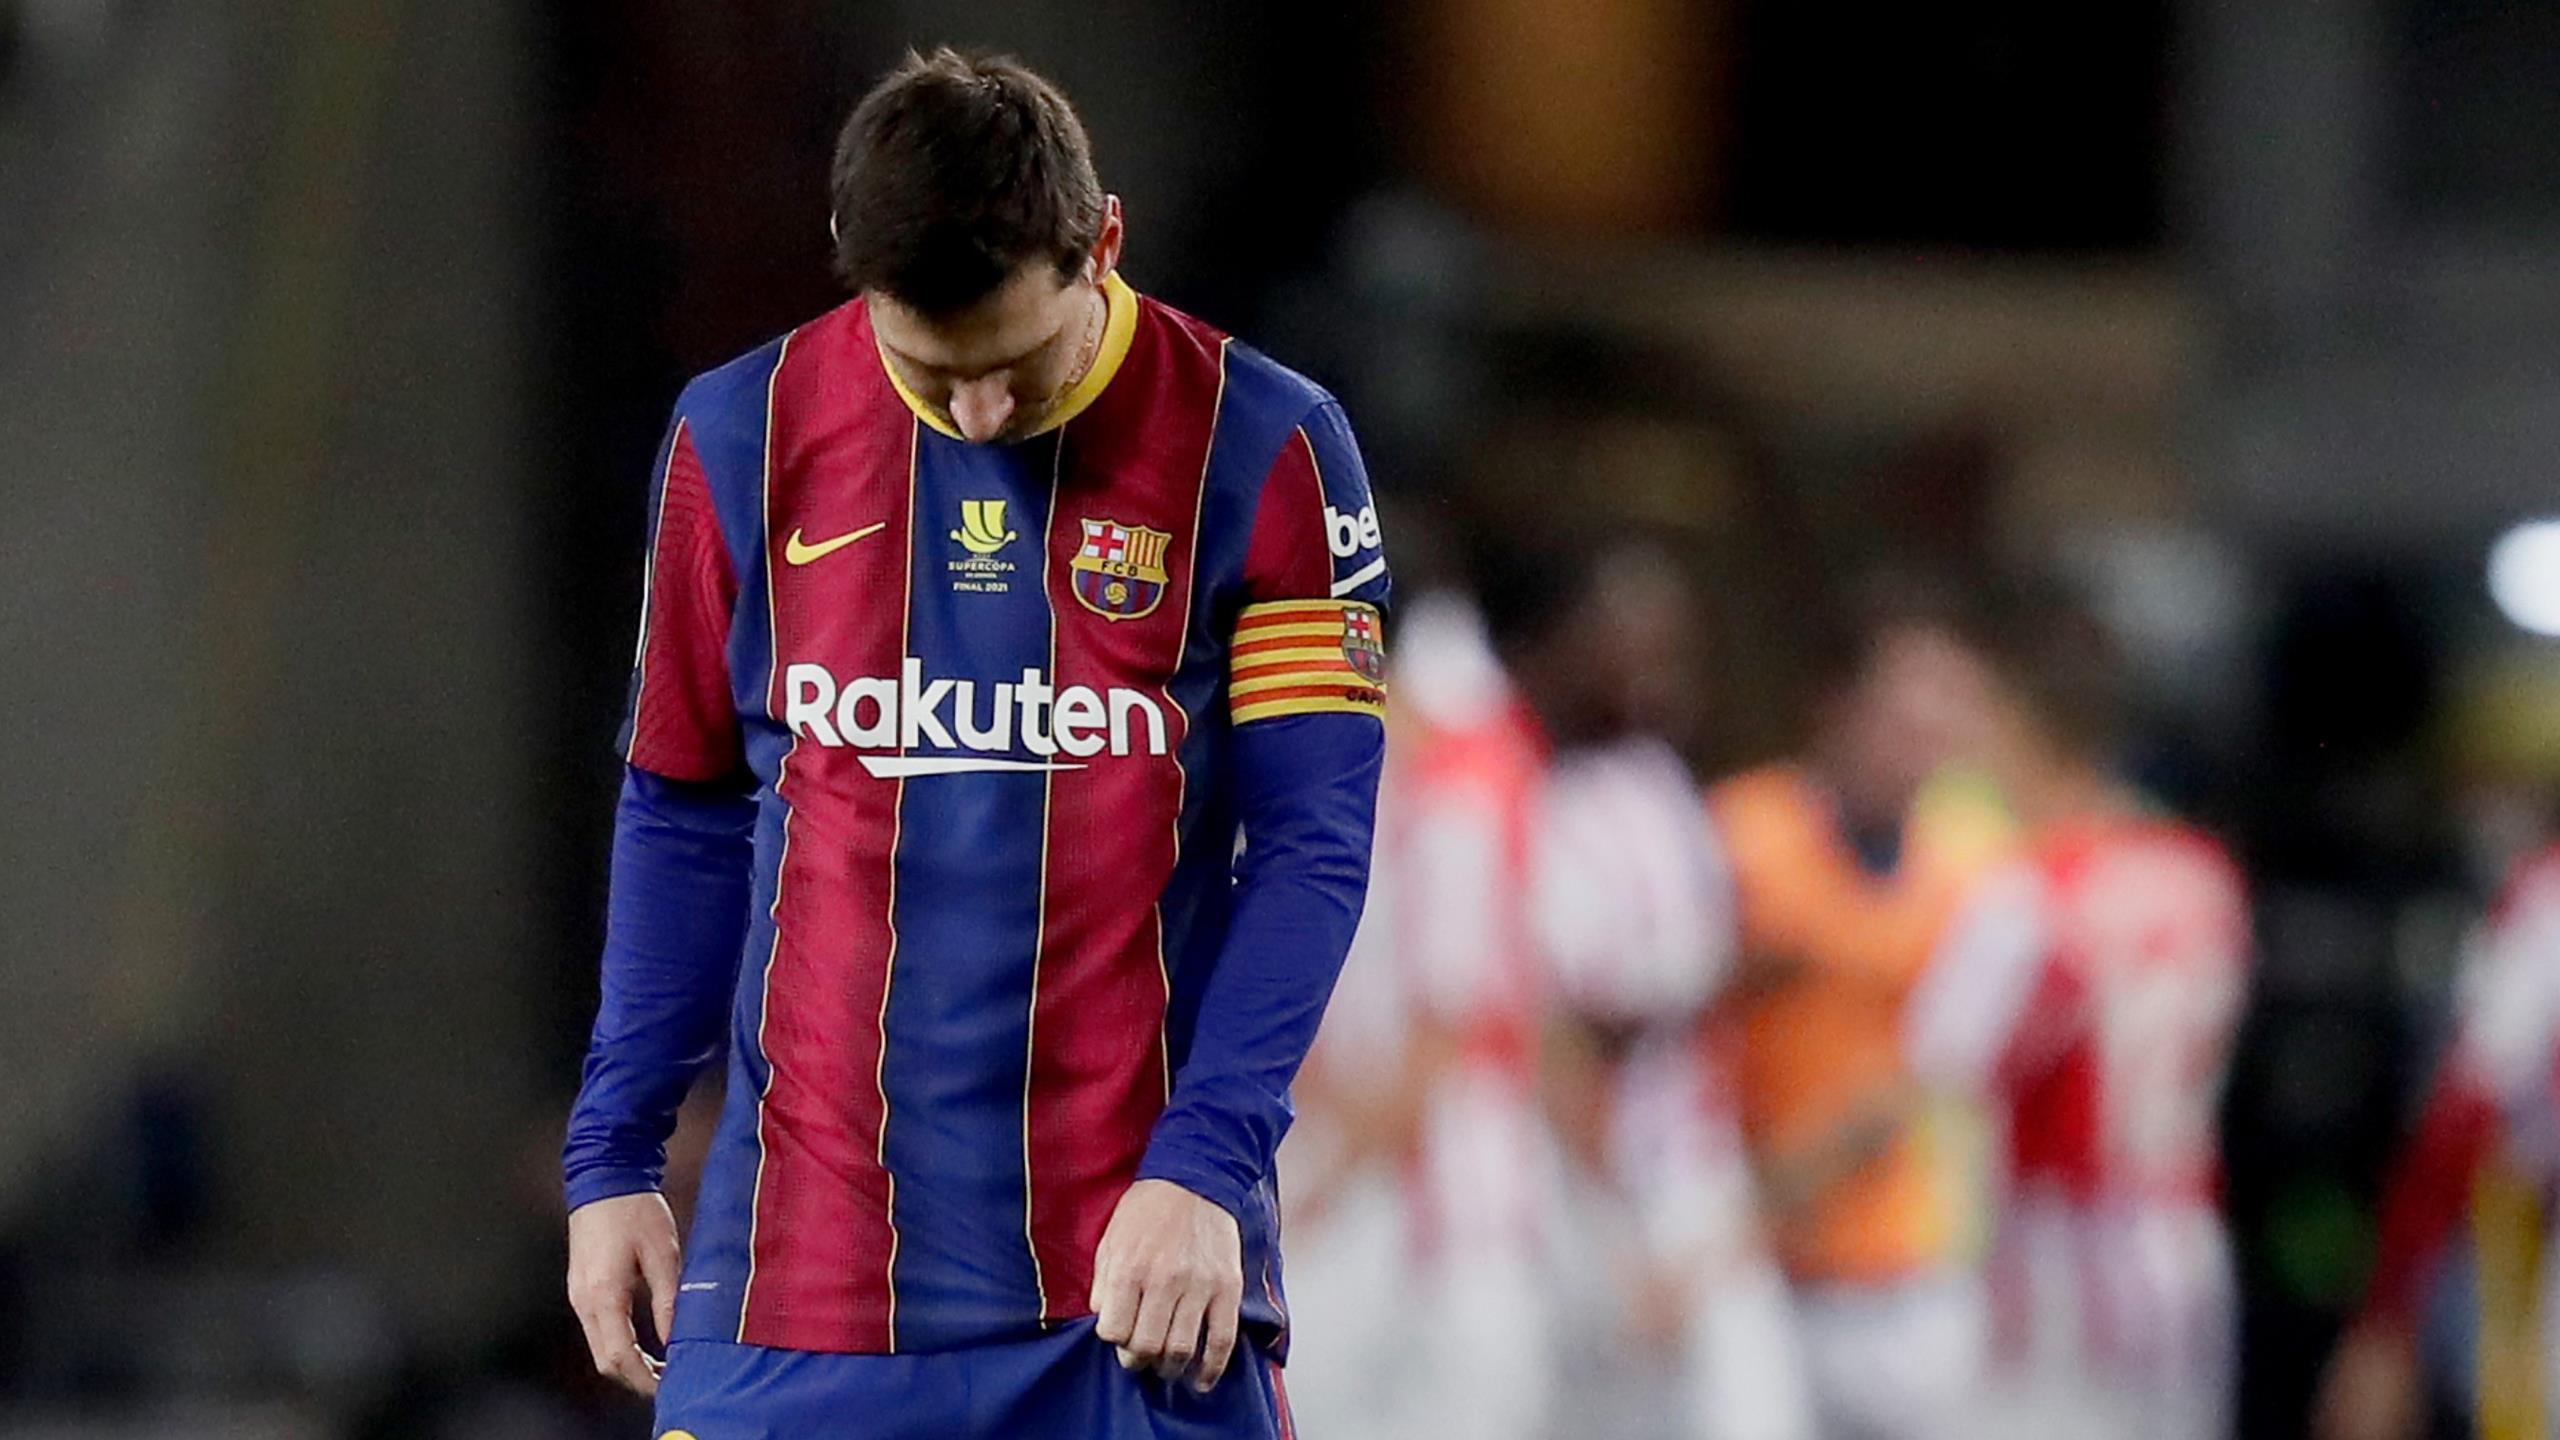 Utd Calendar Spring 2022.Transfer News And Rumours Live Barcelona Fearful Of Messi Exit Man Utd Want Ligue 1 Defender Eurosport